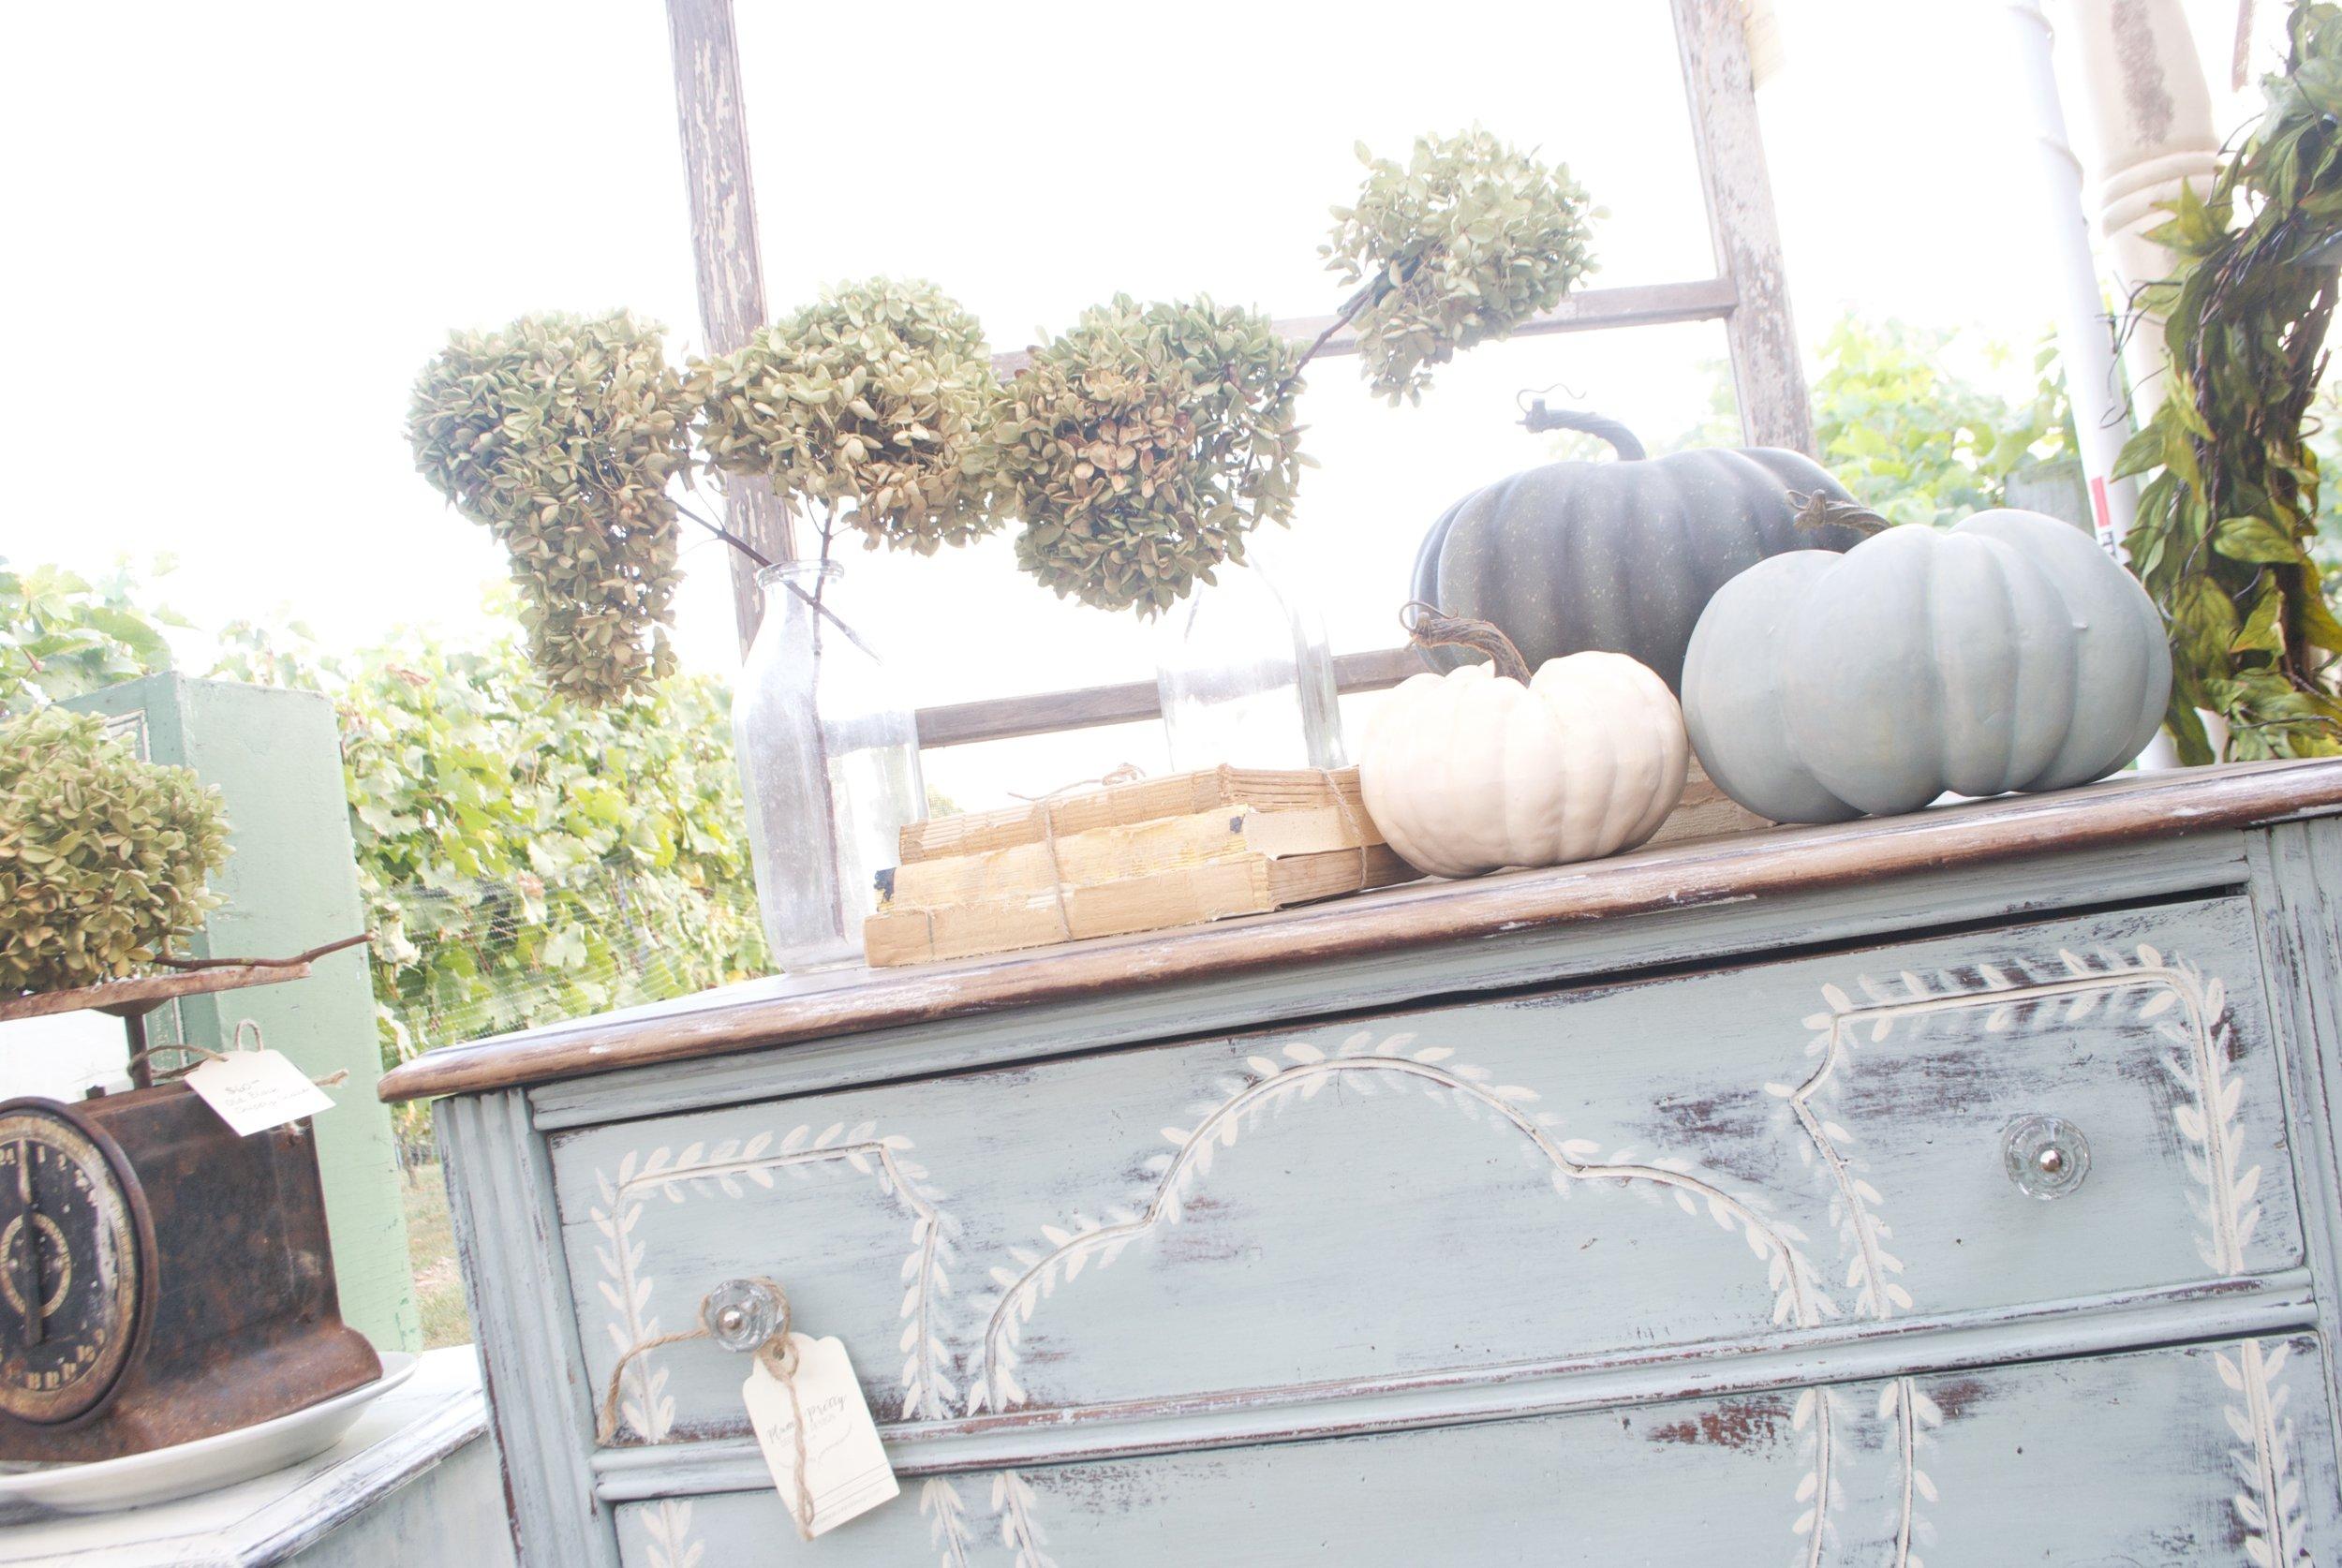 Plum Pretty Decor and Design- The Gray Door Market- Fall Booth Design